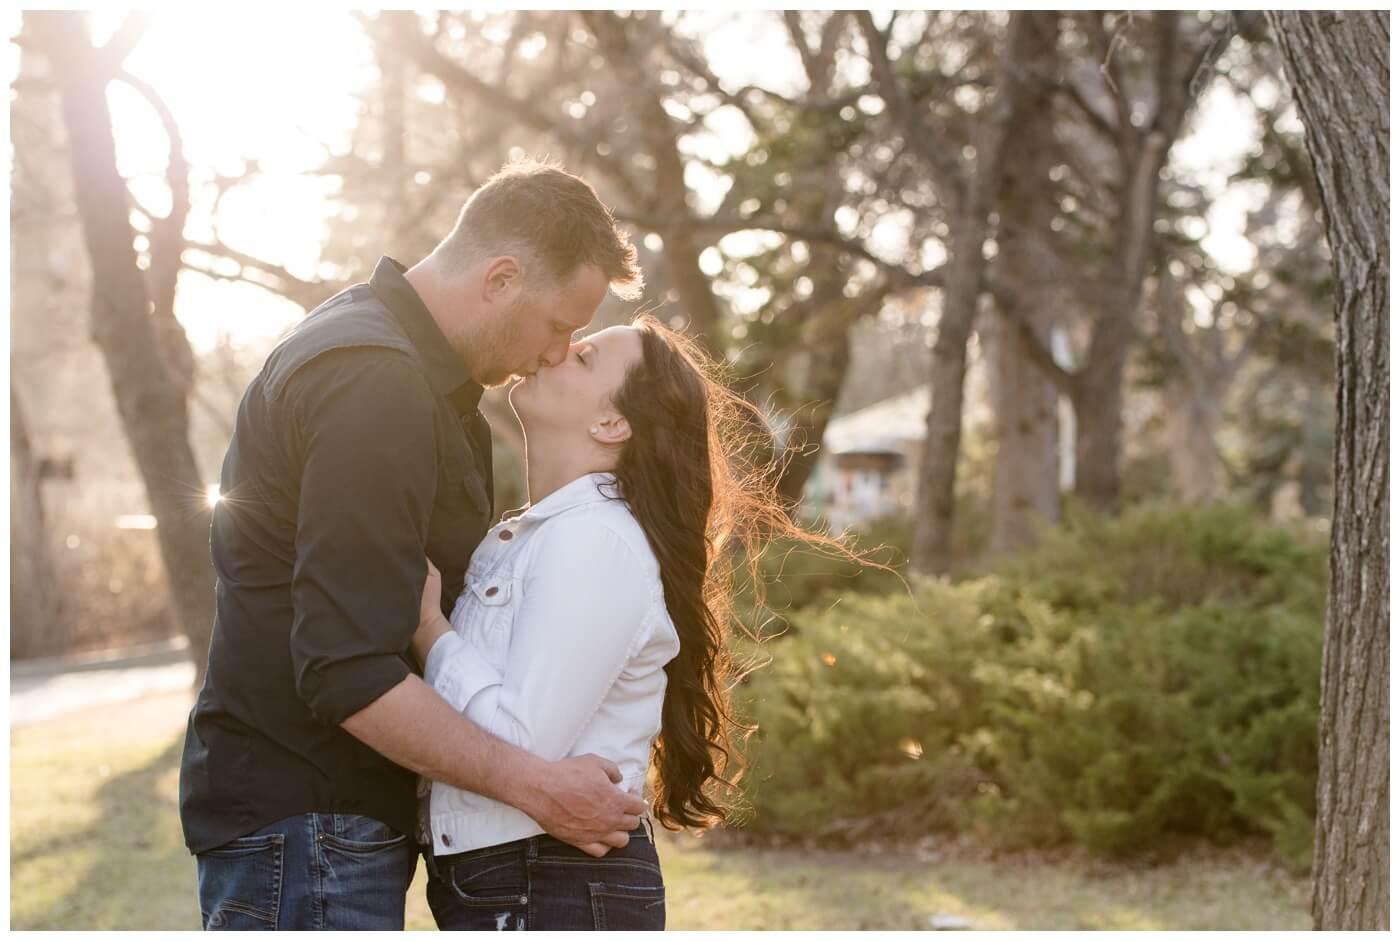 Travis & Coralynn Regina Engagement Session- Engagement in Wascana Park